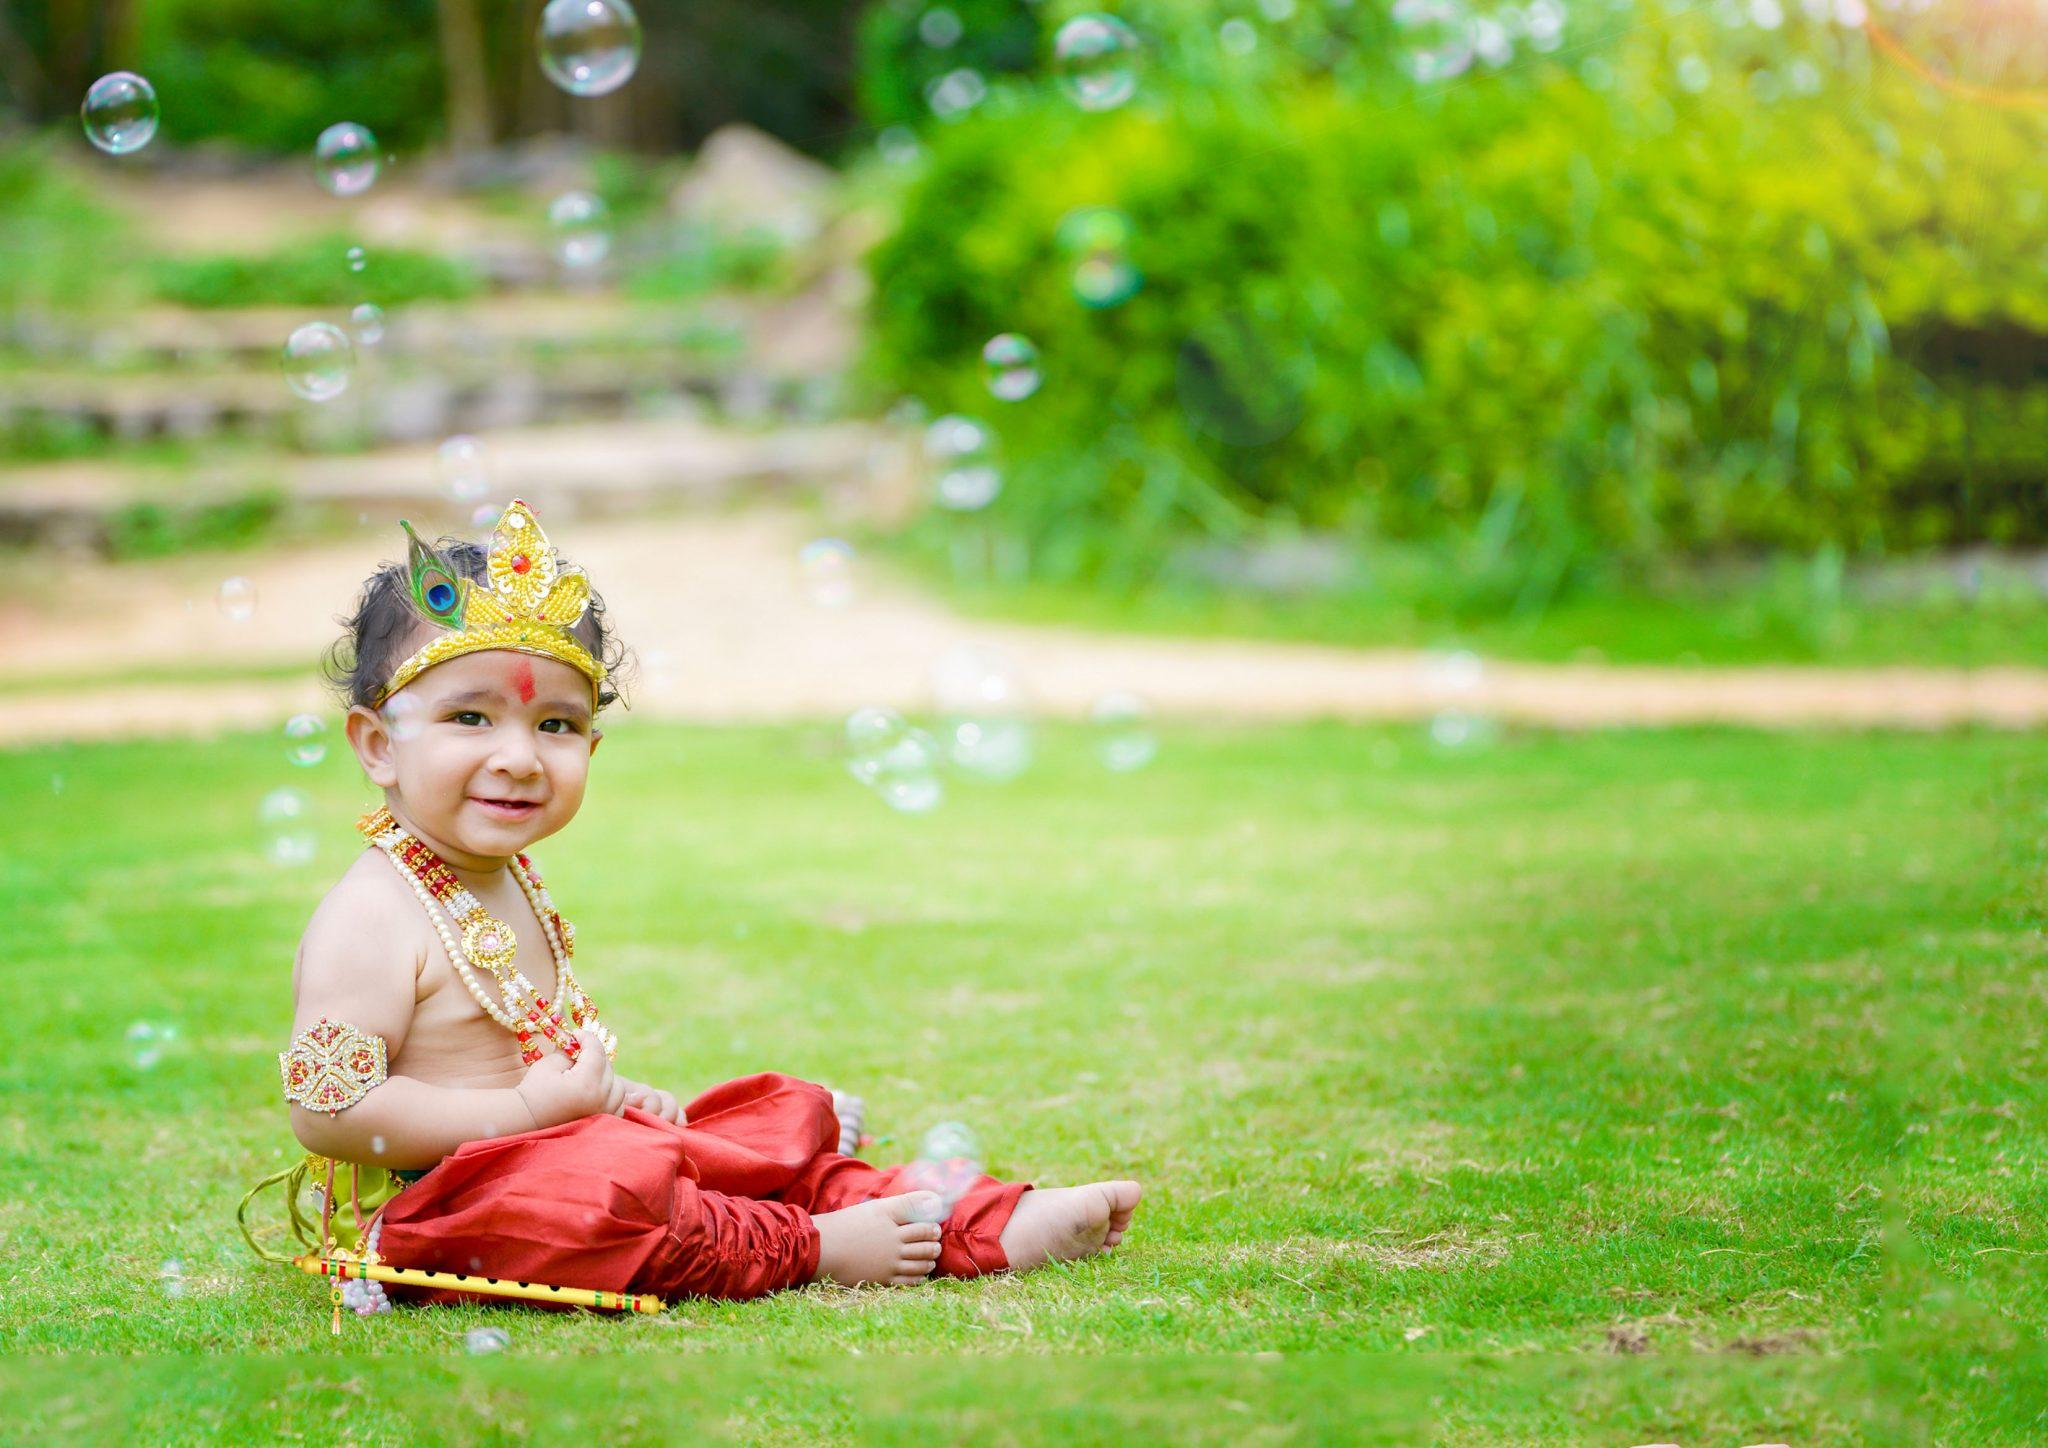 kids photoshoot kids photography baby boy photoshoot pre birthday photoshoot hyderabad telangana